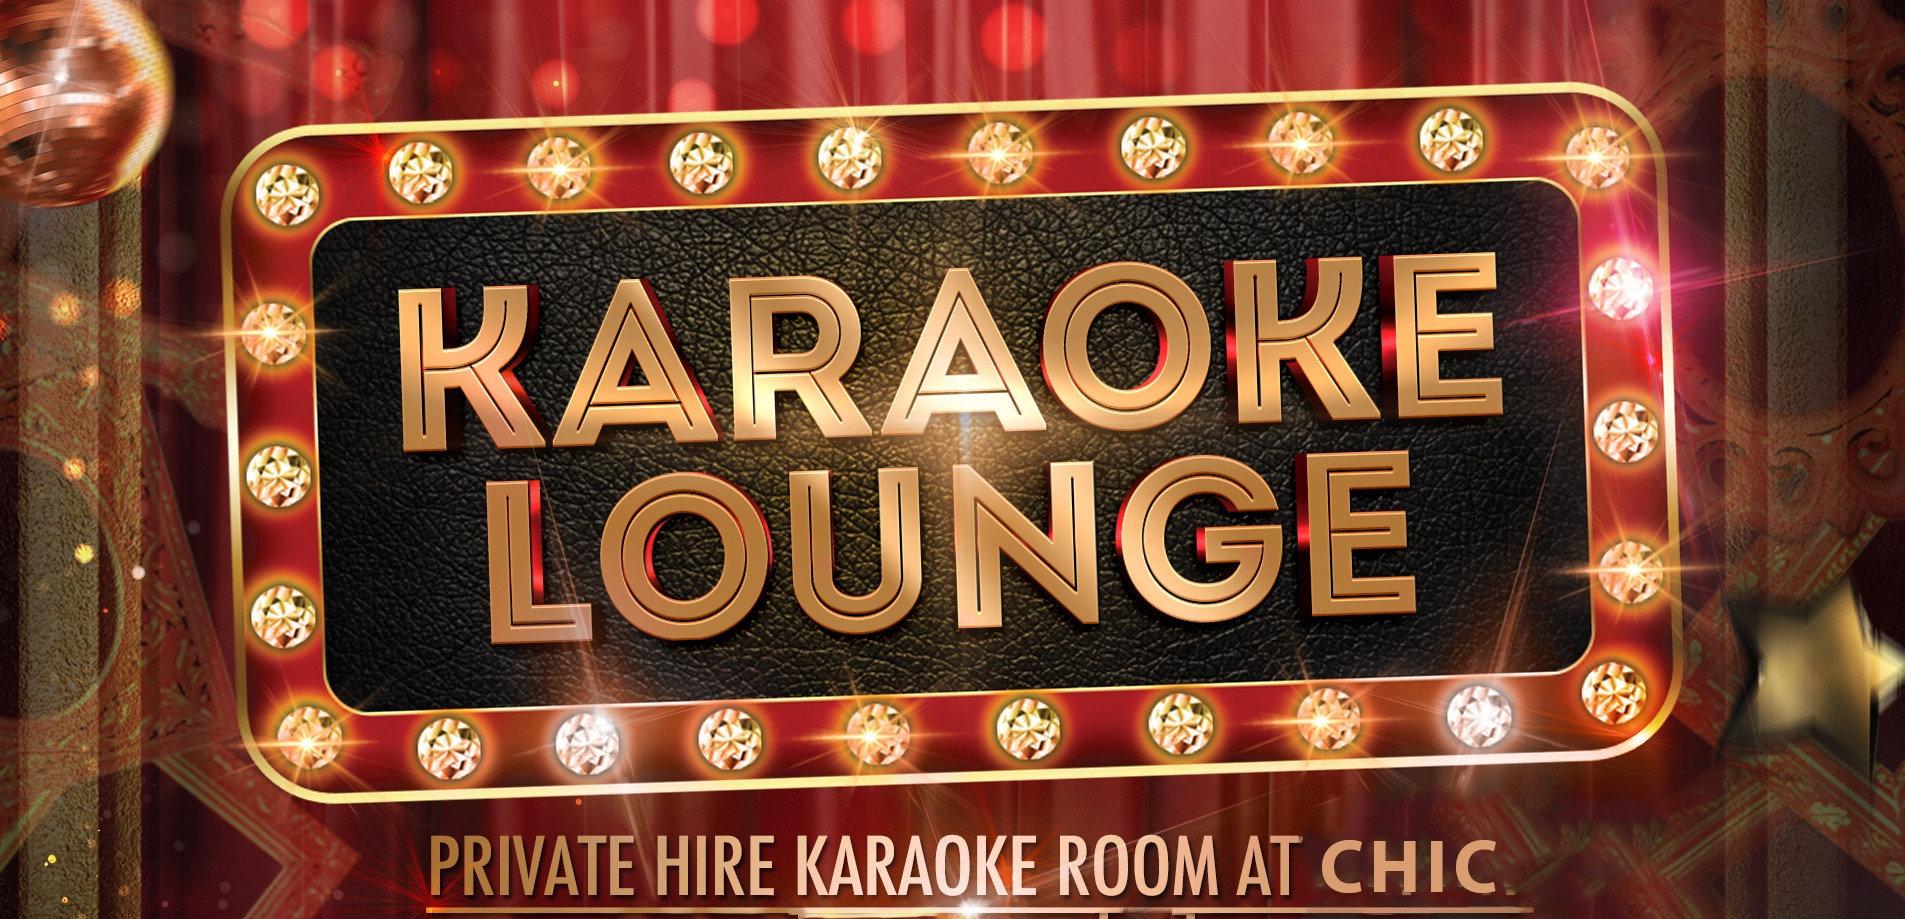 Private Karaoke Sunday - Thursday rate